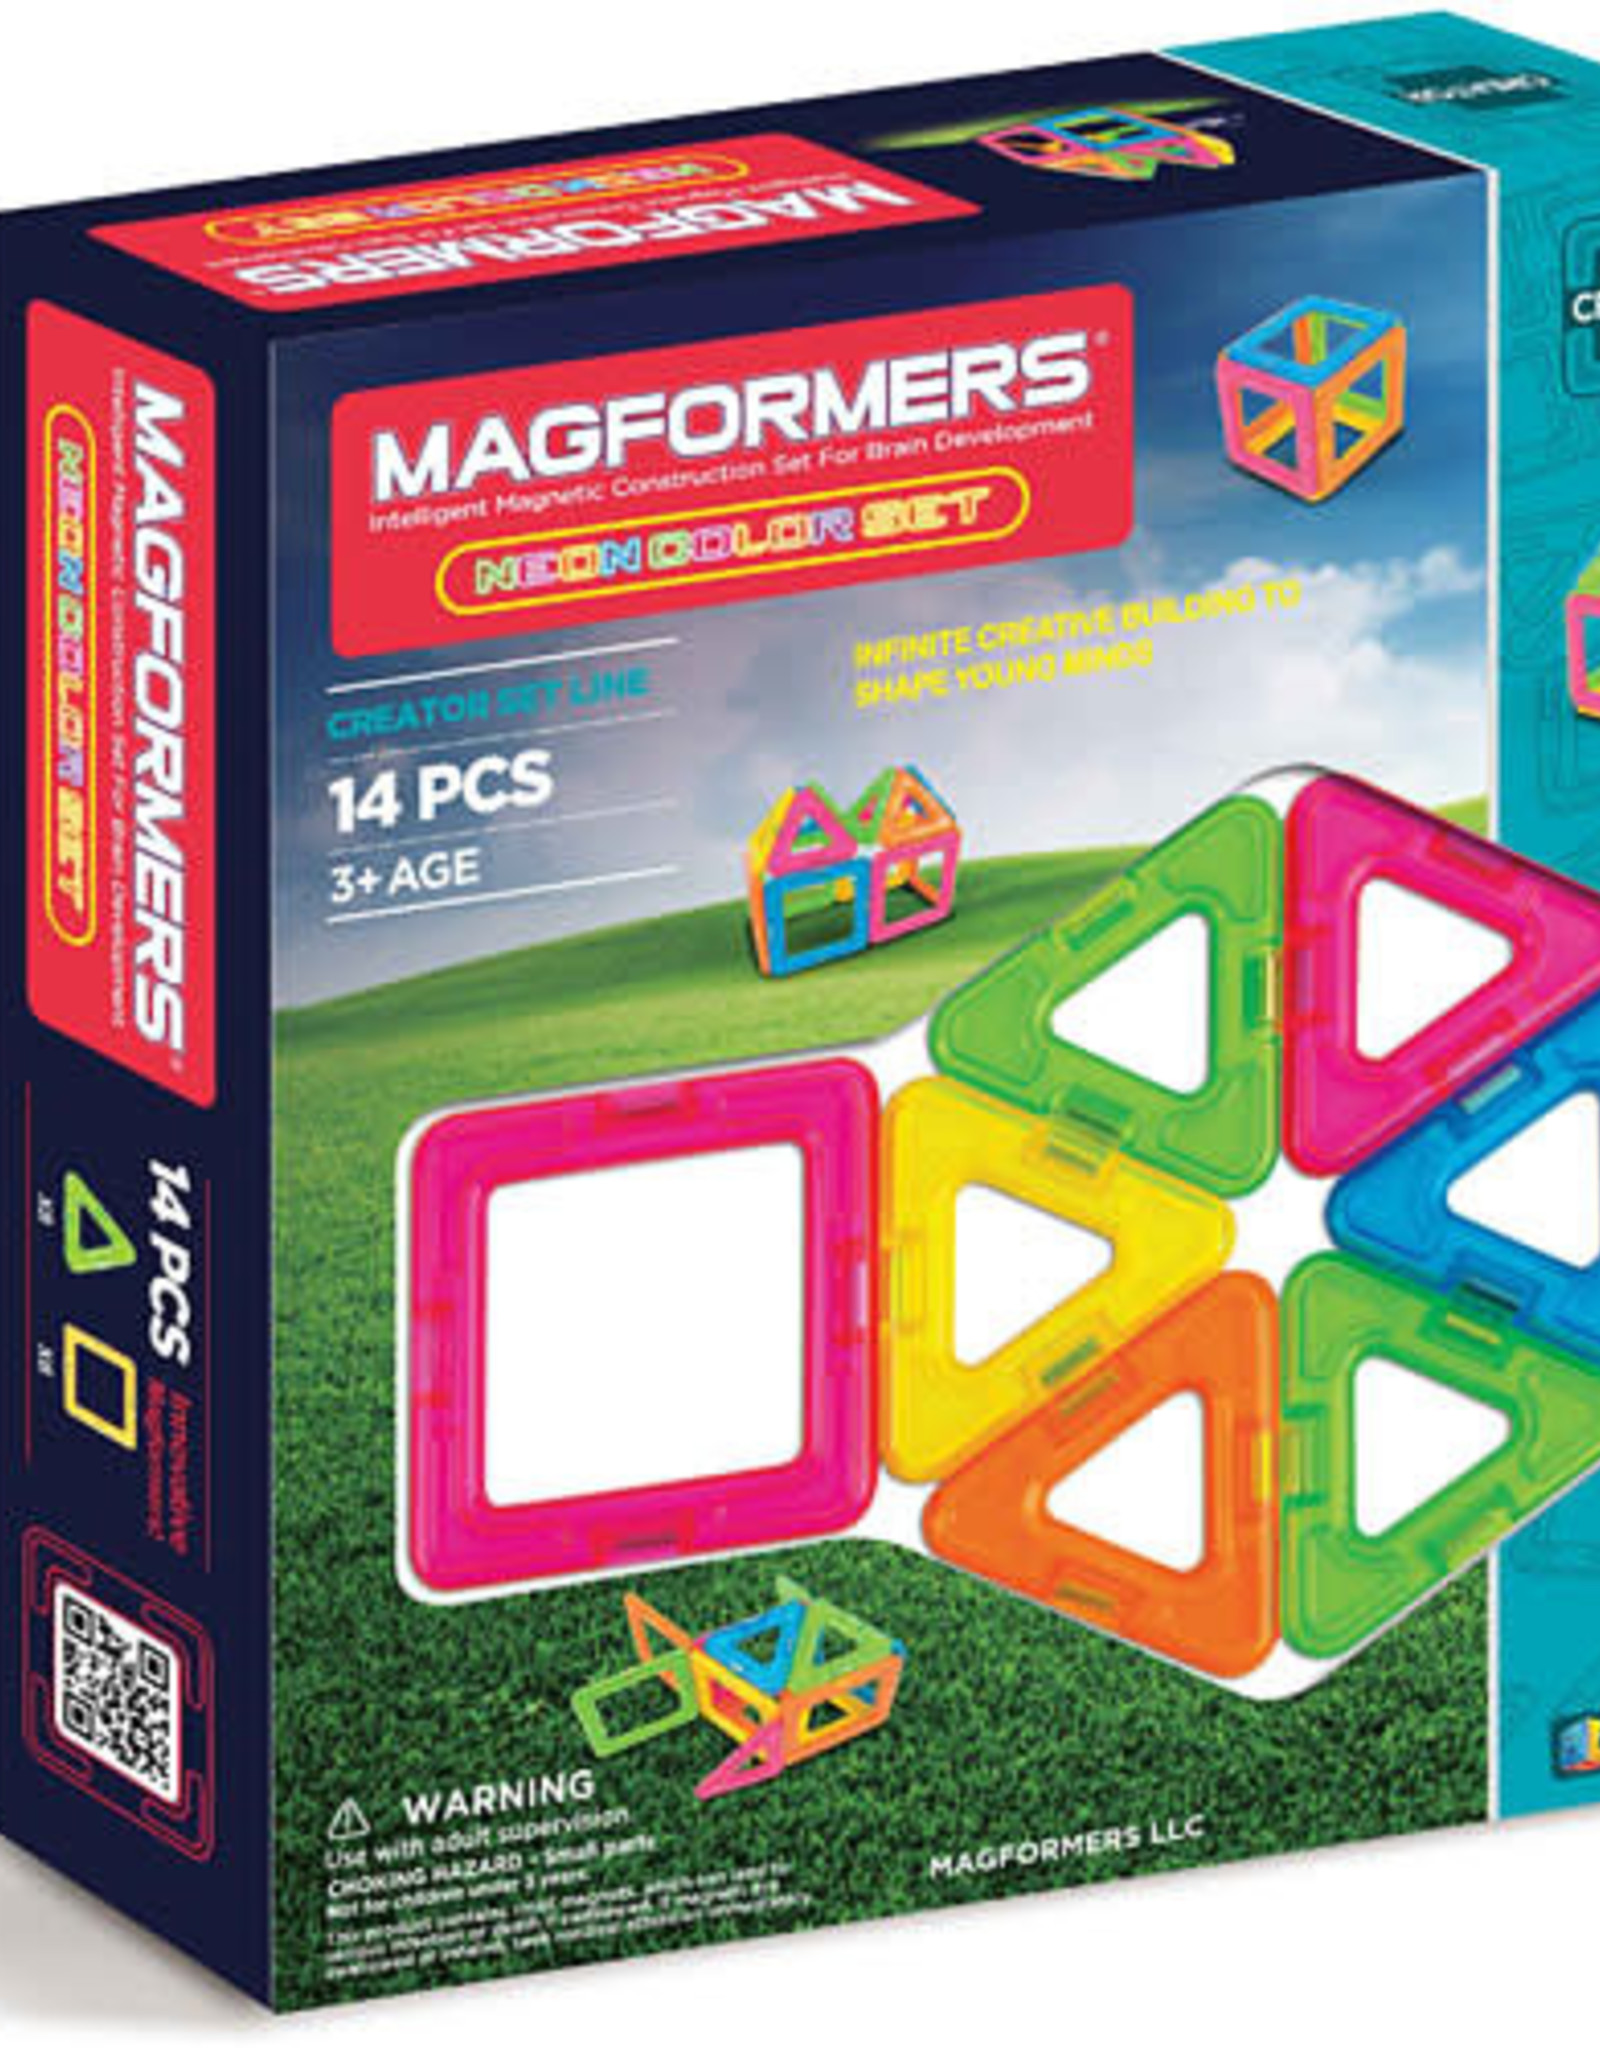 Magnaformers LLC Magnaformers Basic Neon 14-Piece